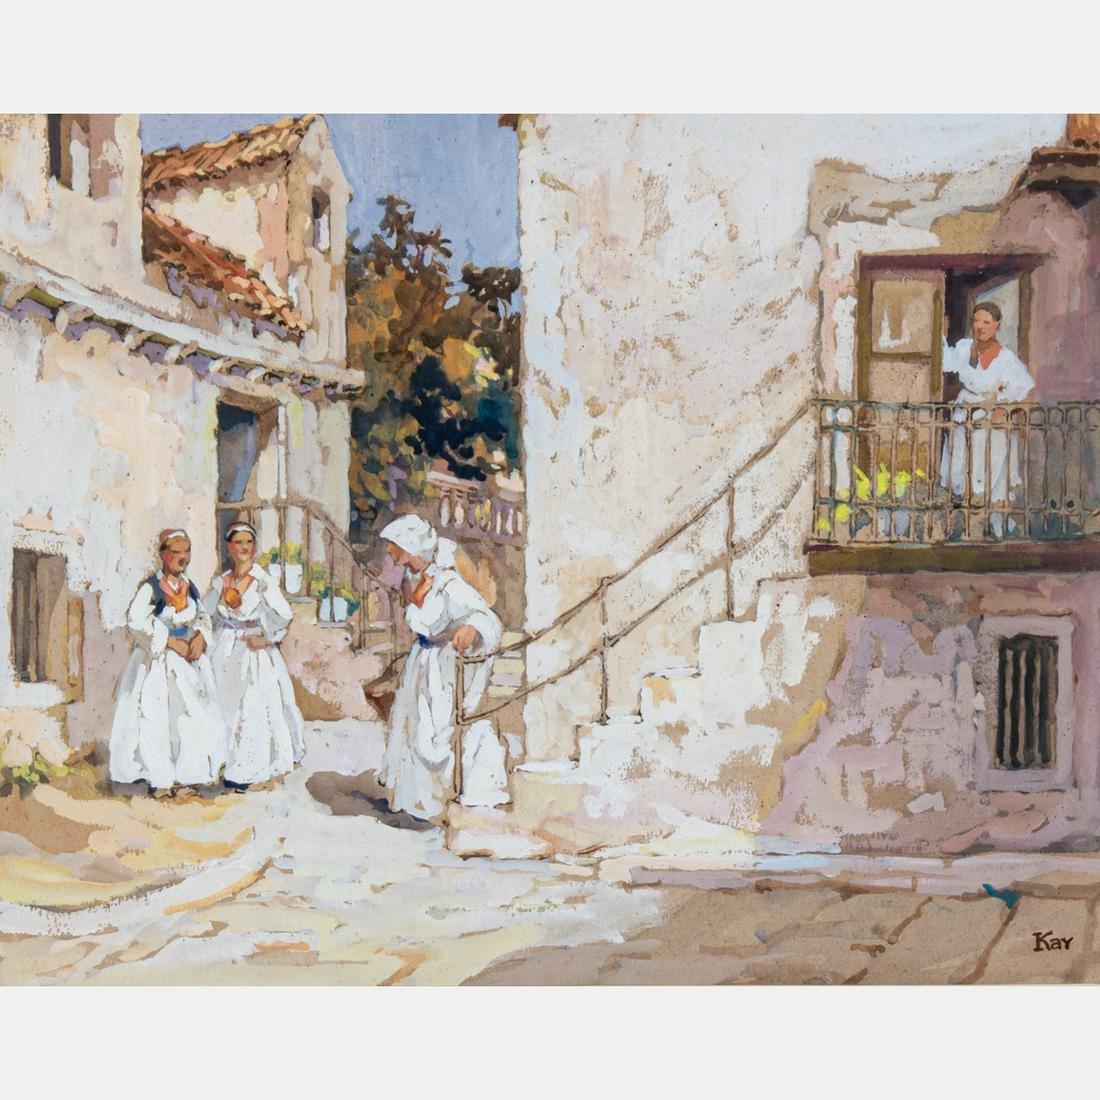 Gertude Kay (American, 1884-1939) Mexico, Watercolor on